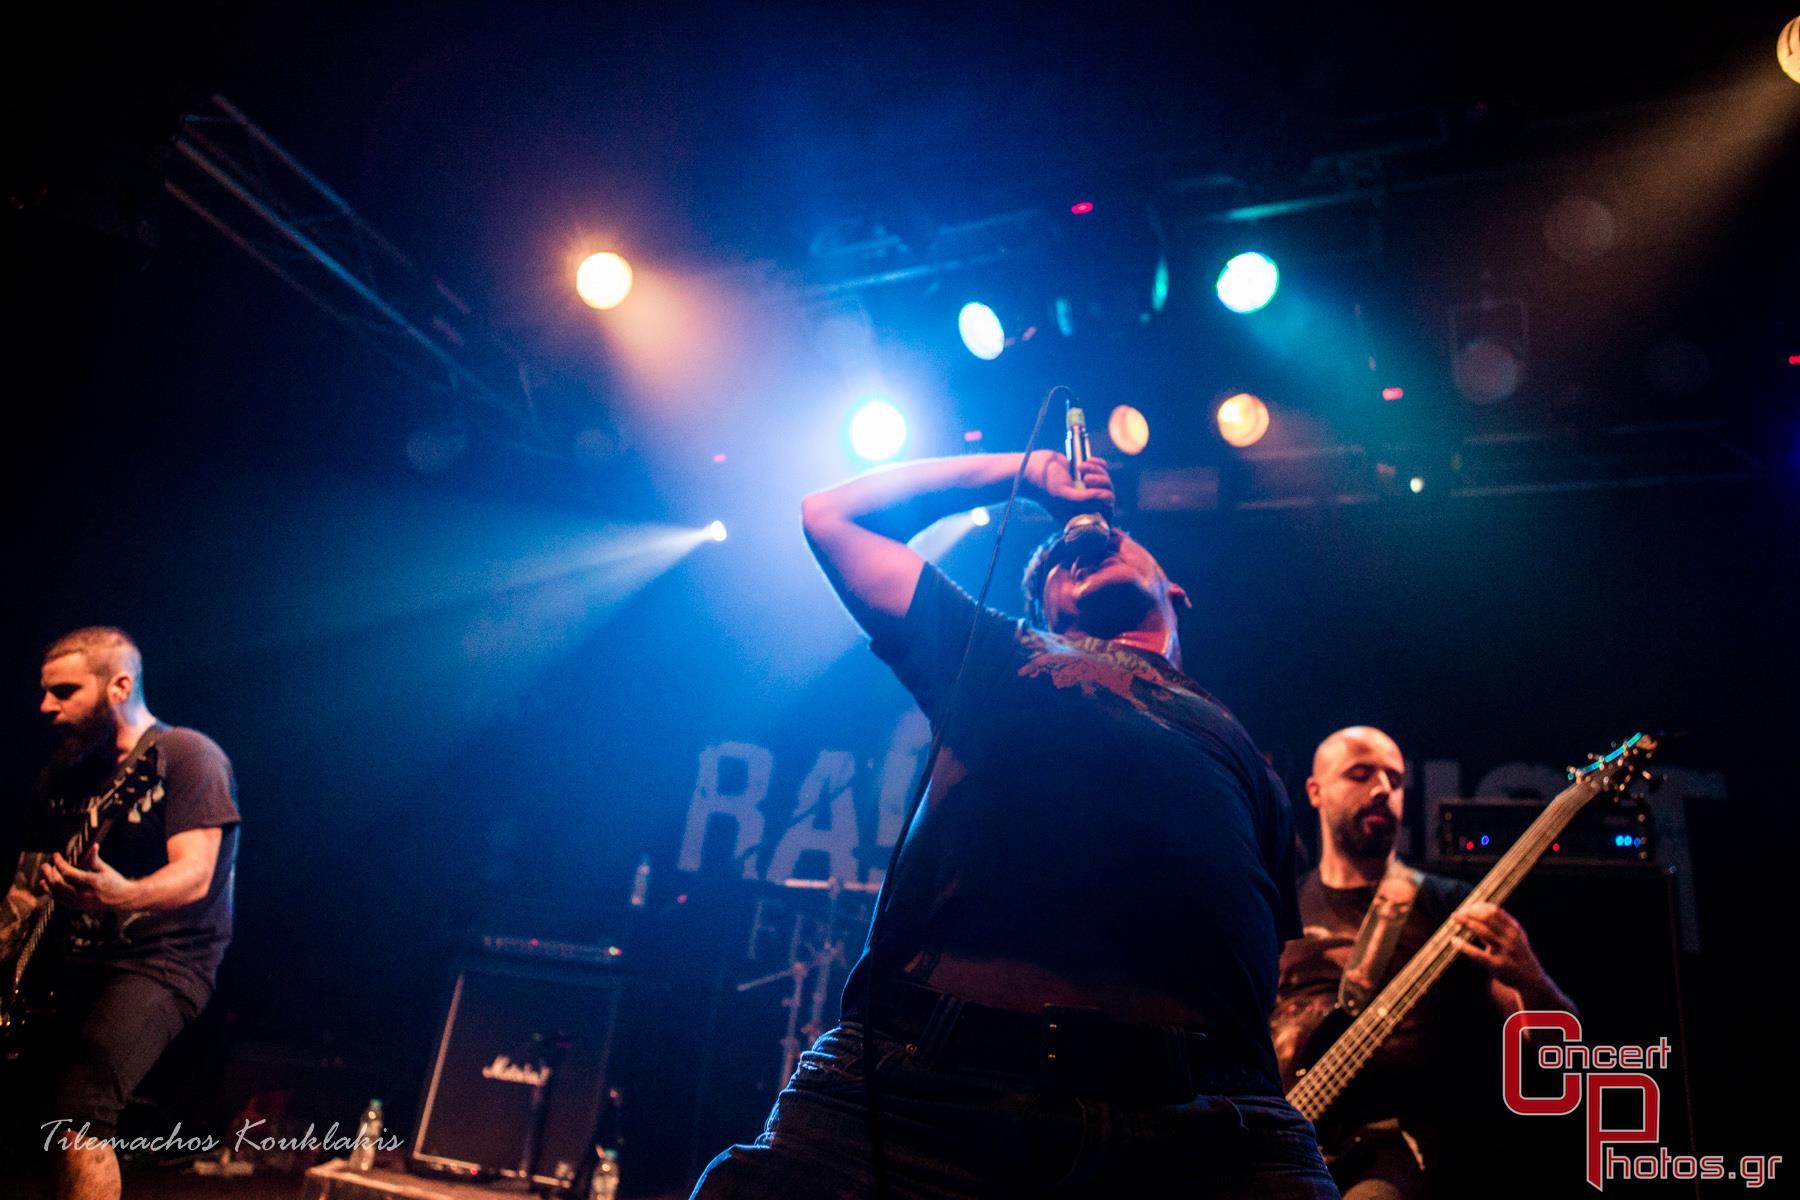 Raised Fist - Endsight - The Locals-Raised Fist photographer:  - Endsight_01